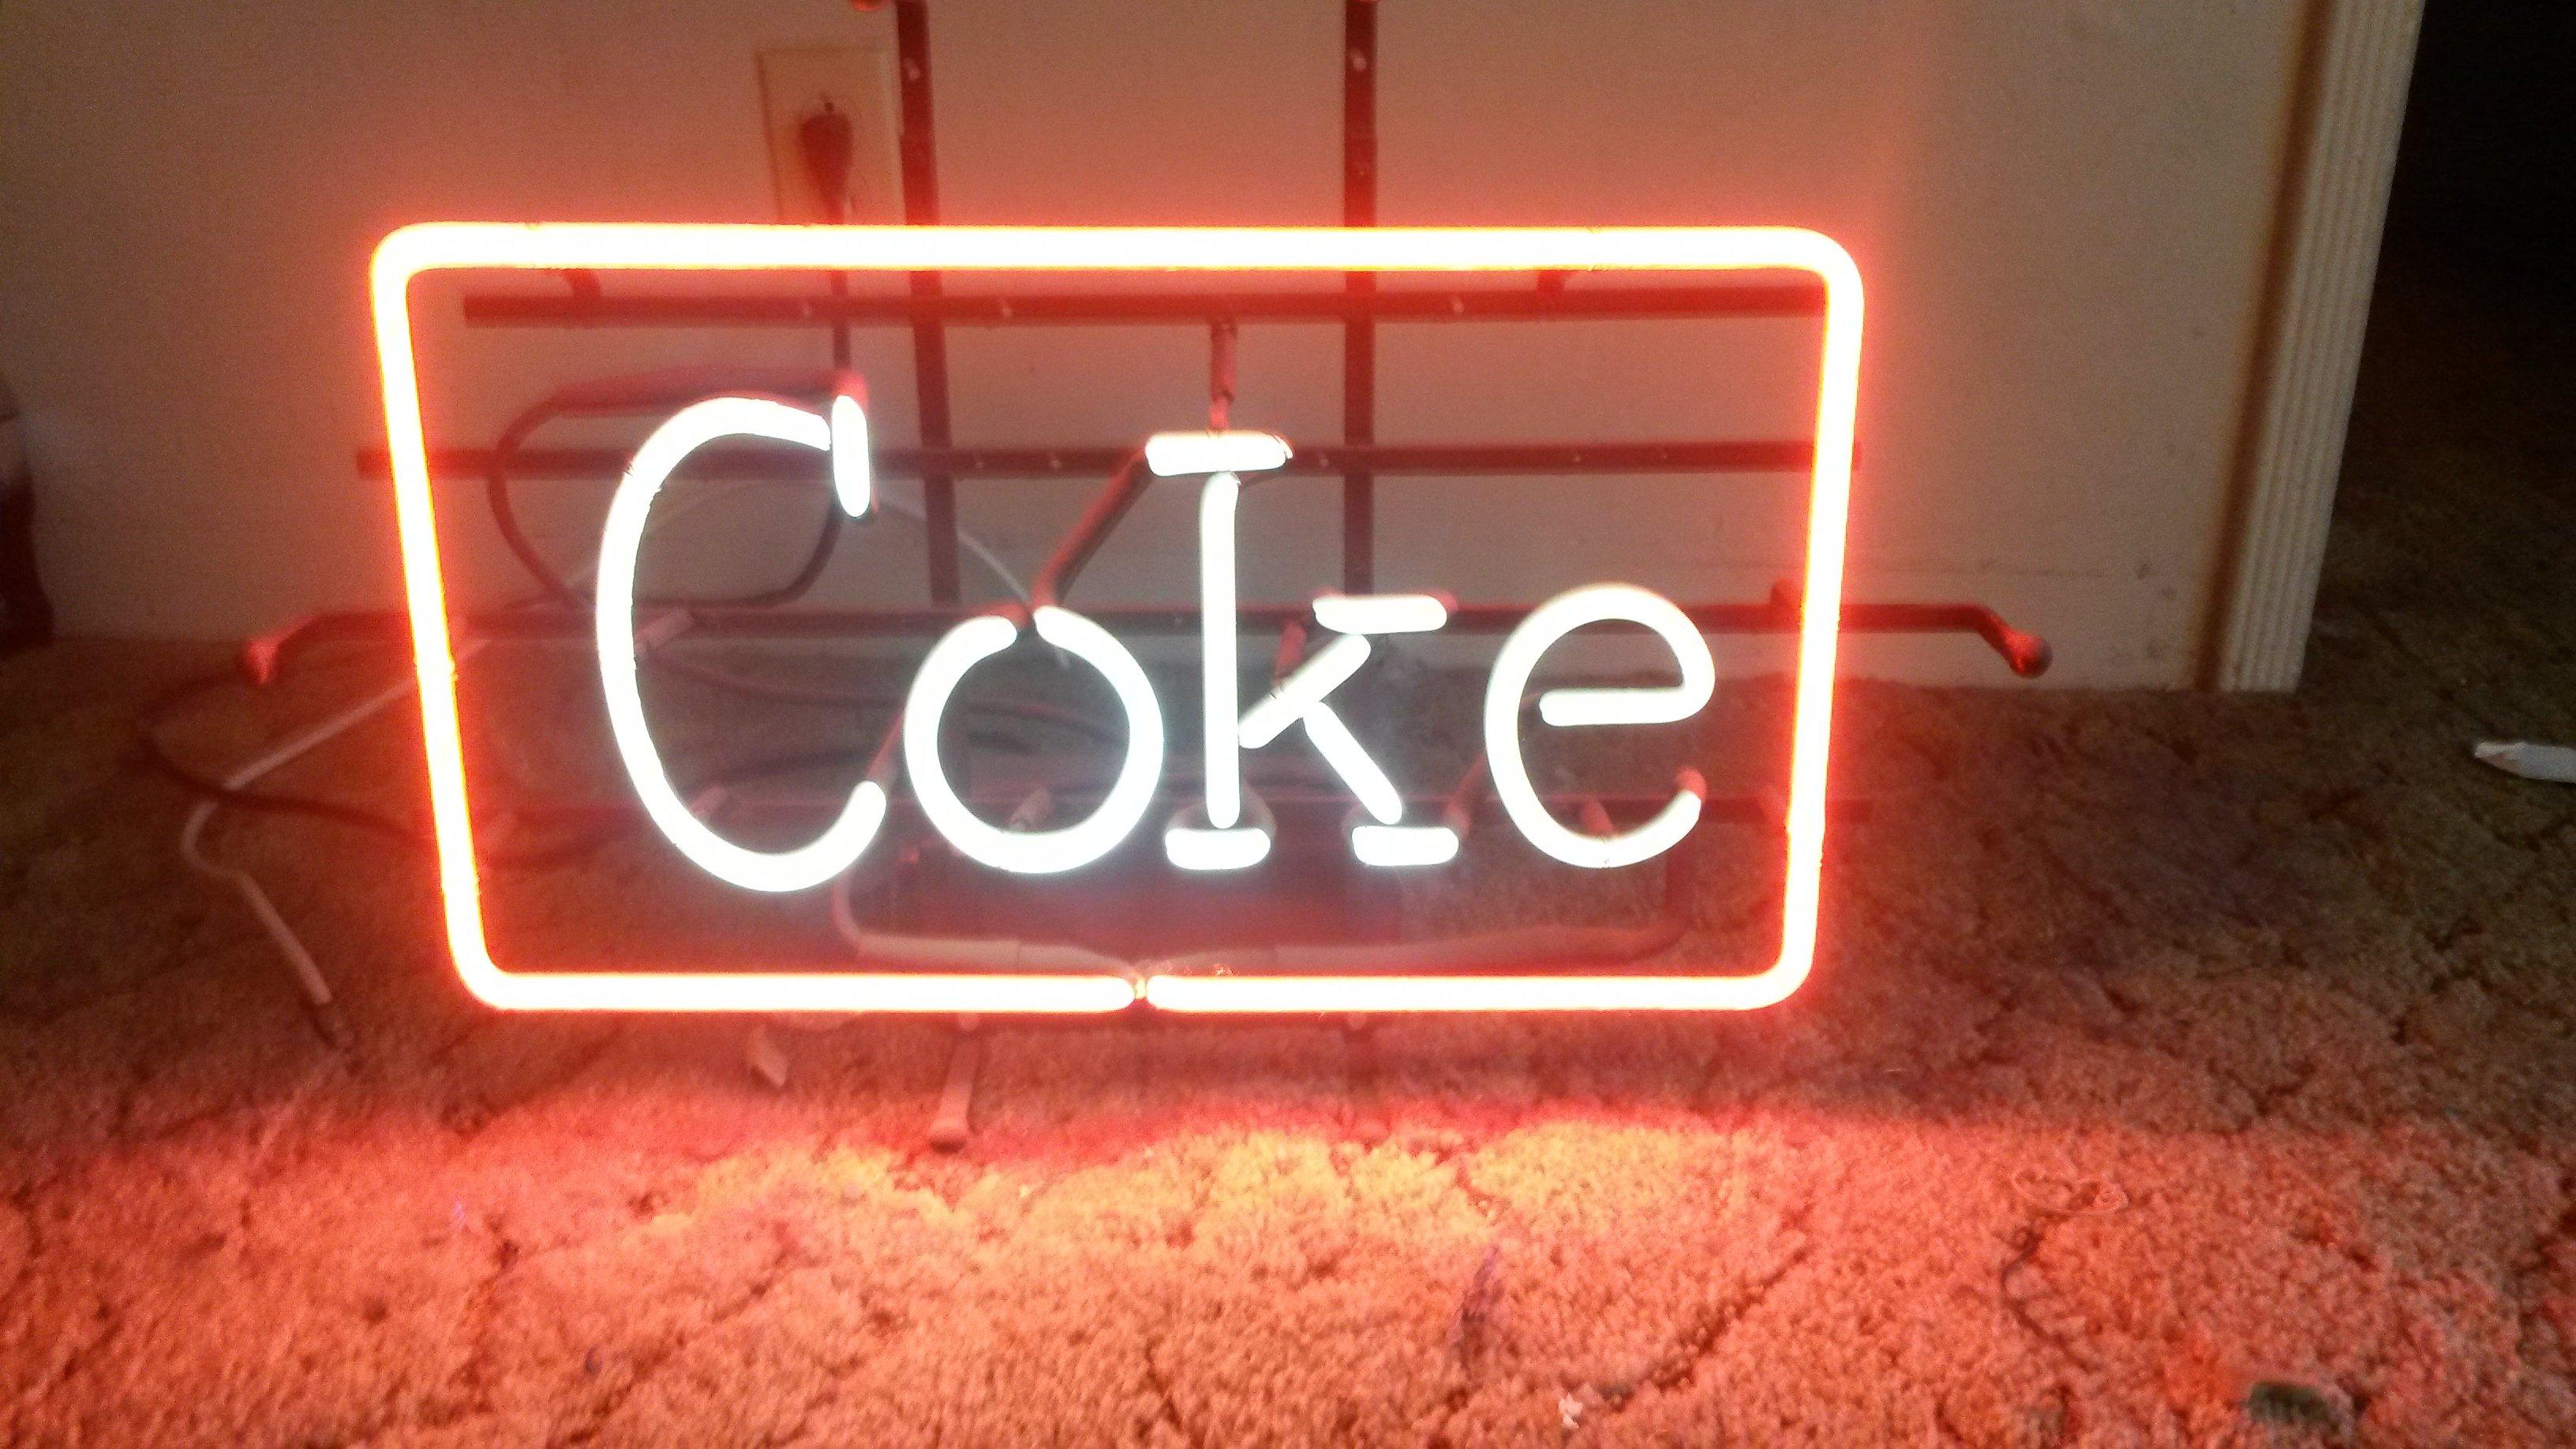 neon coke signs sign miller budweiser guitar lite rancho cucamonga california arcade